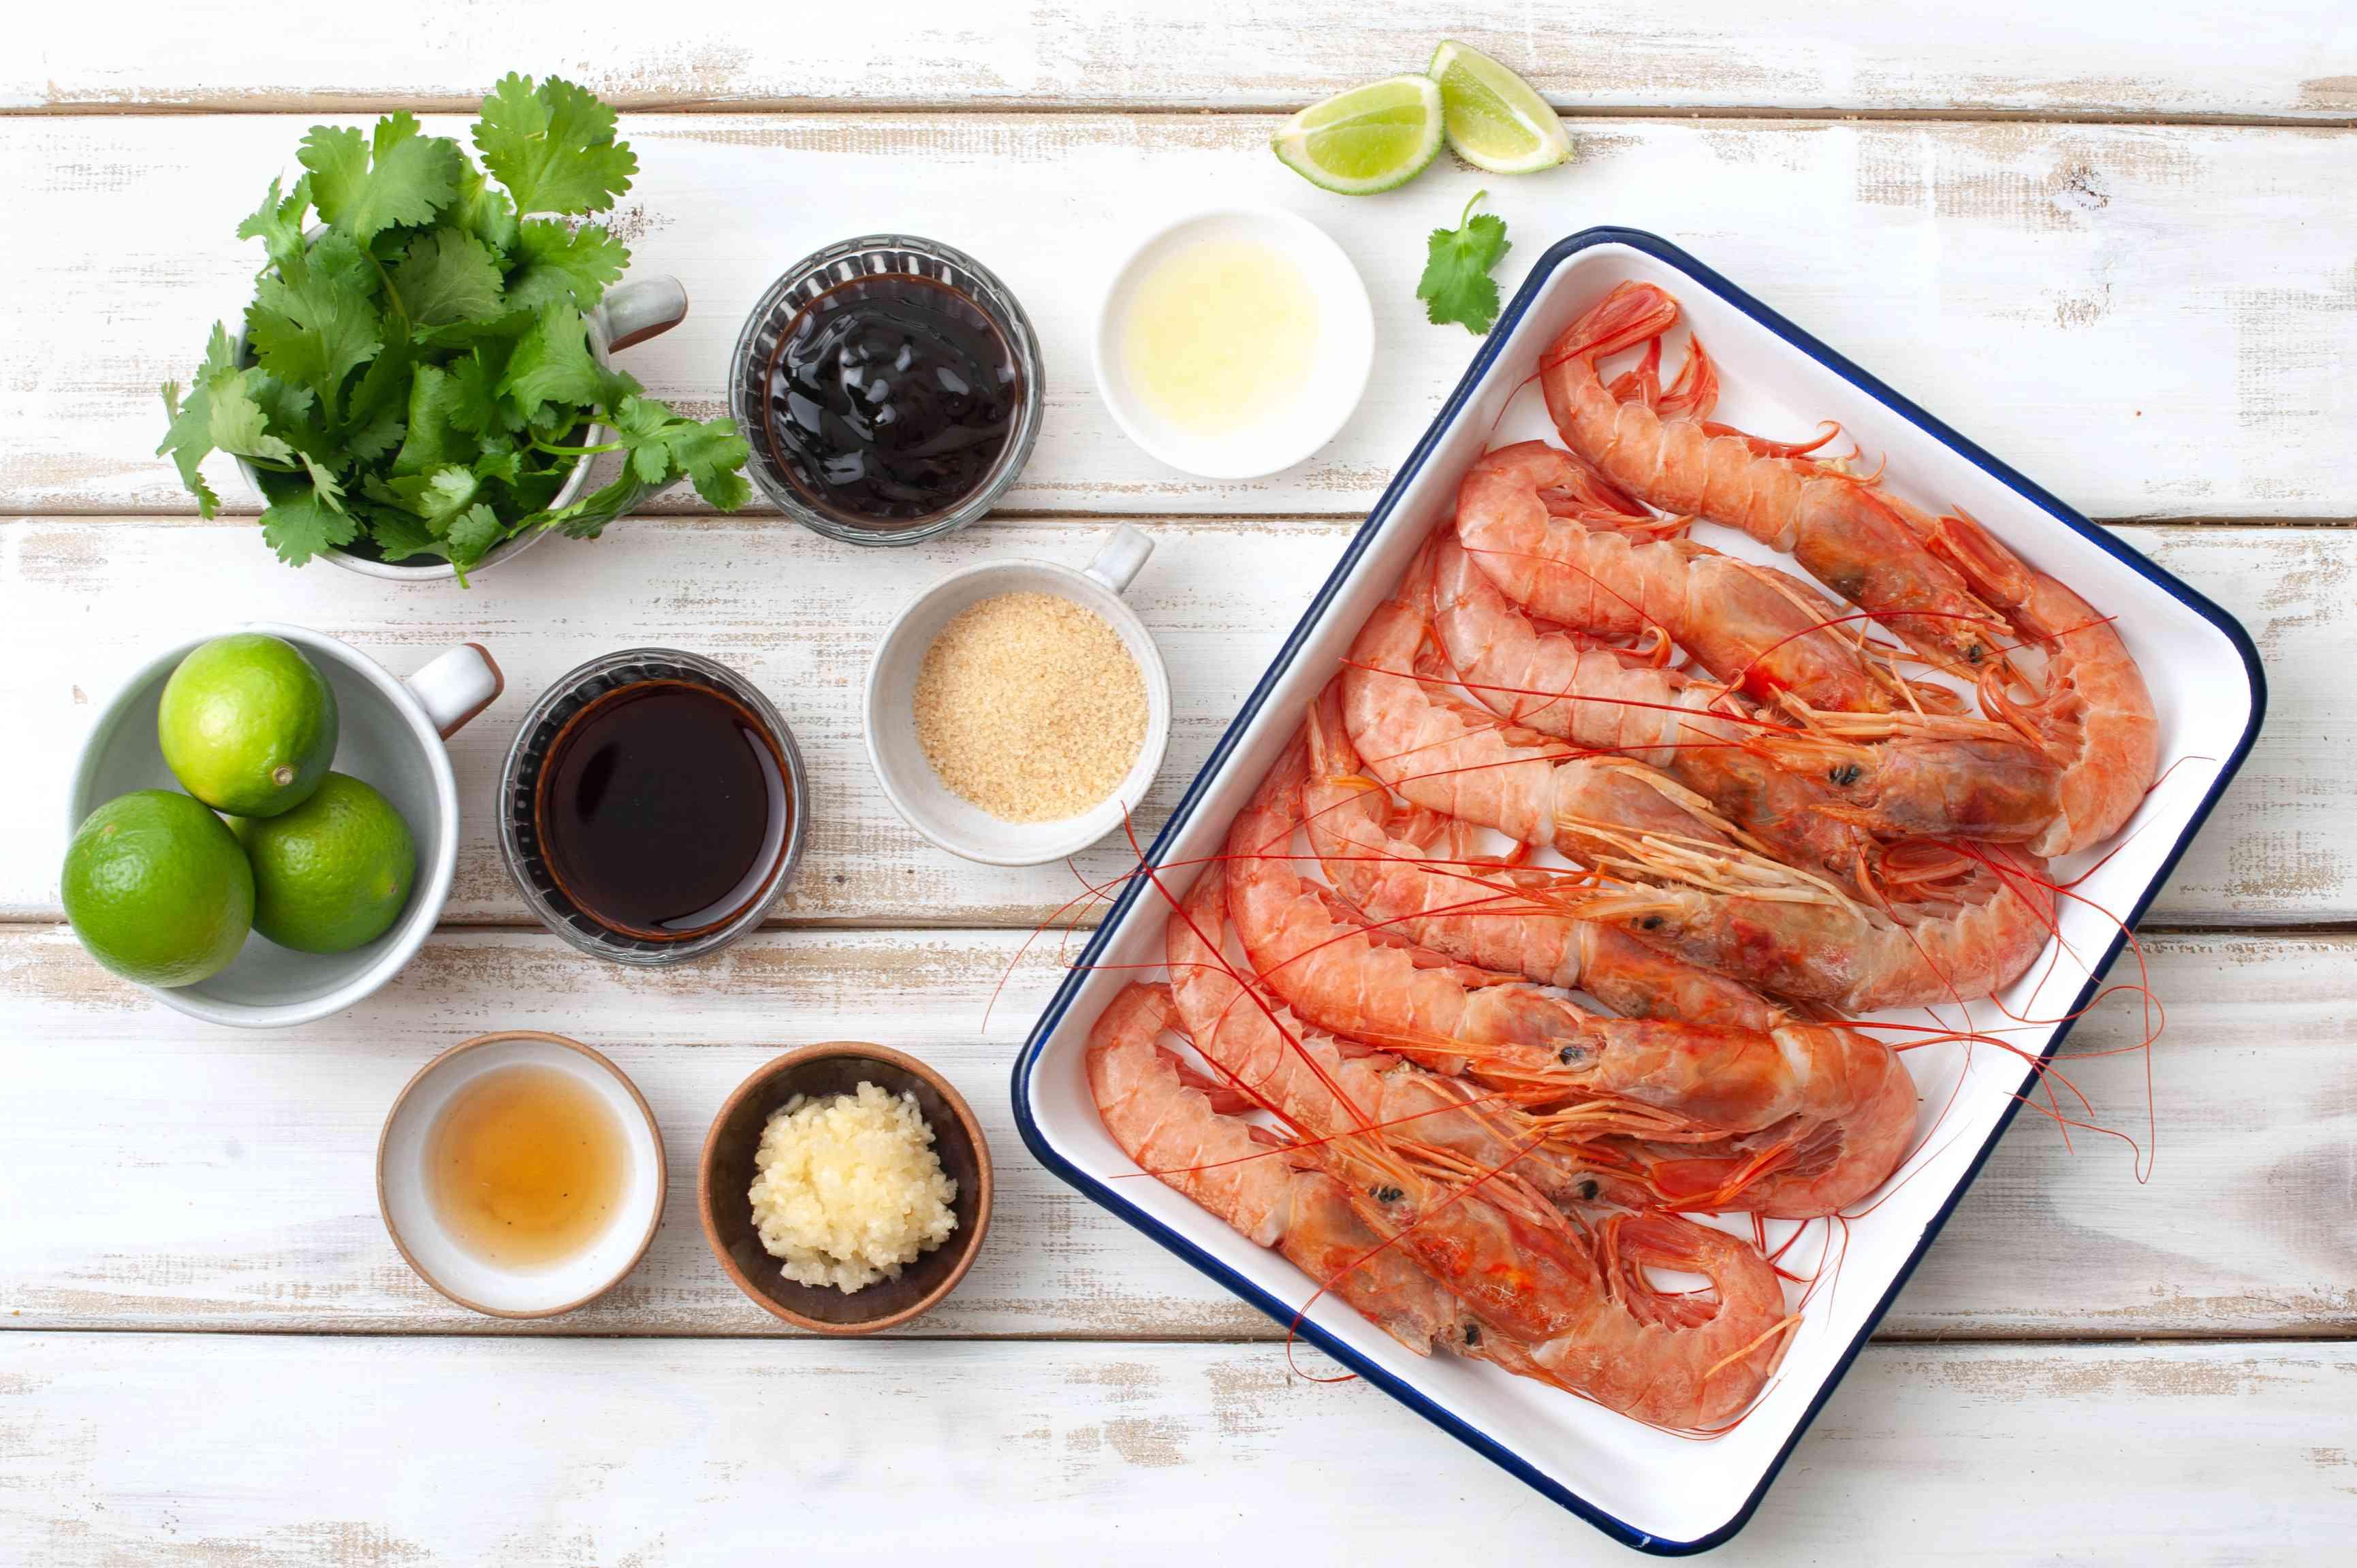 Ingredients for BBQ Thai garlic shrimp